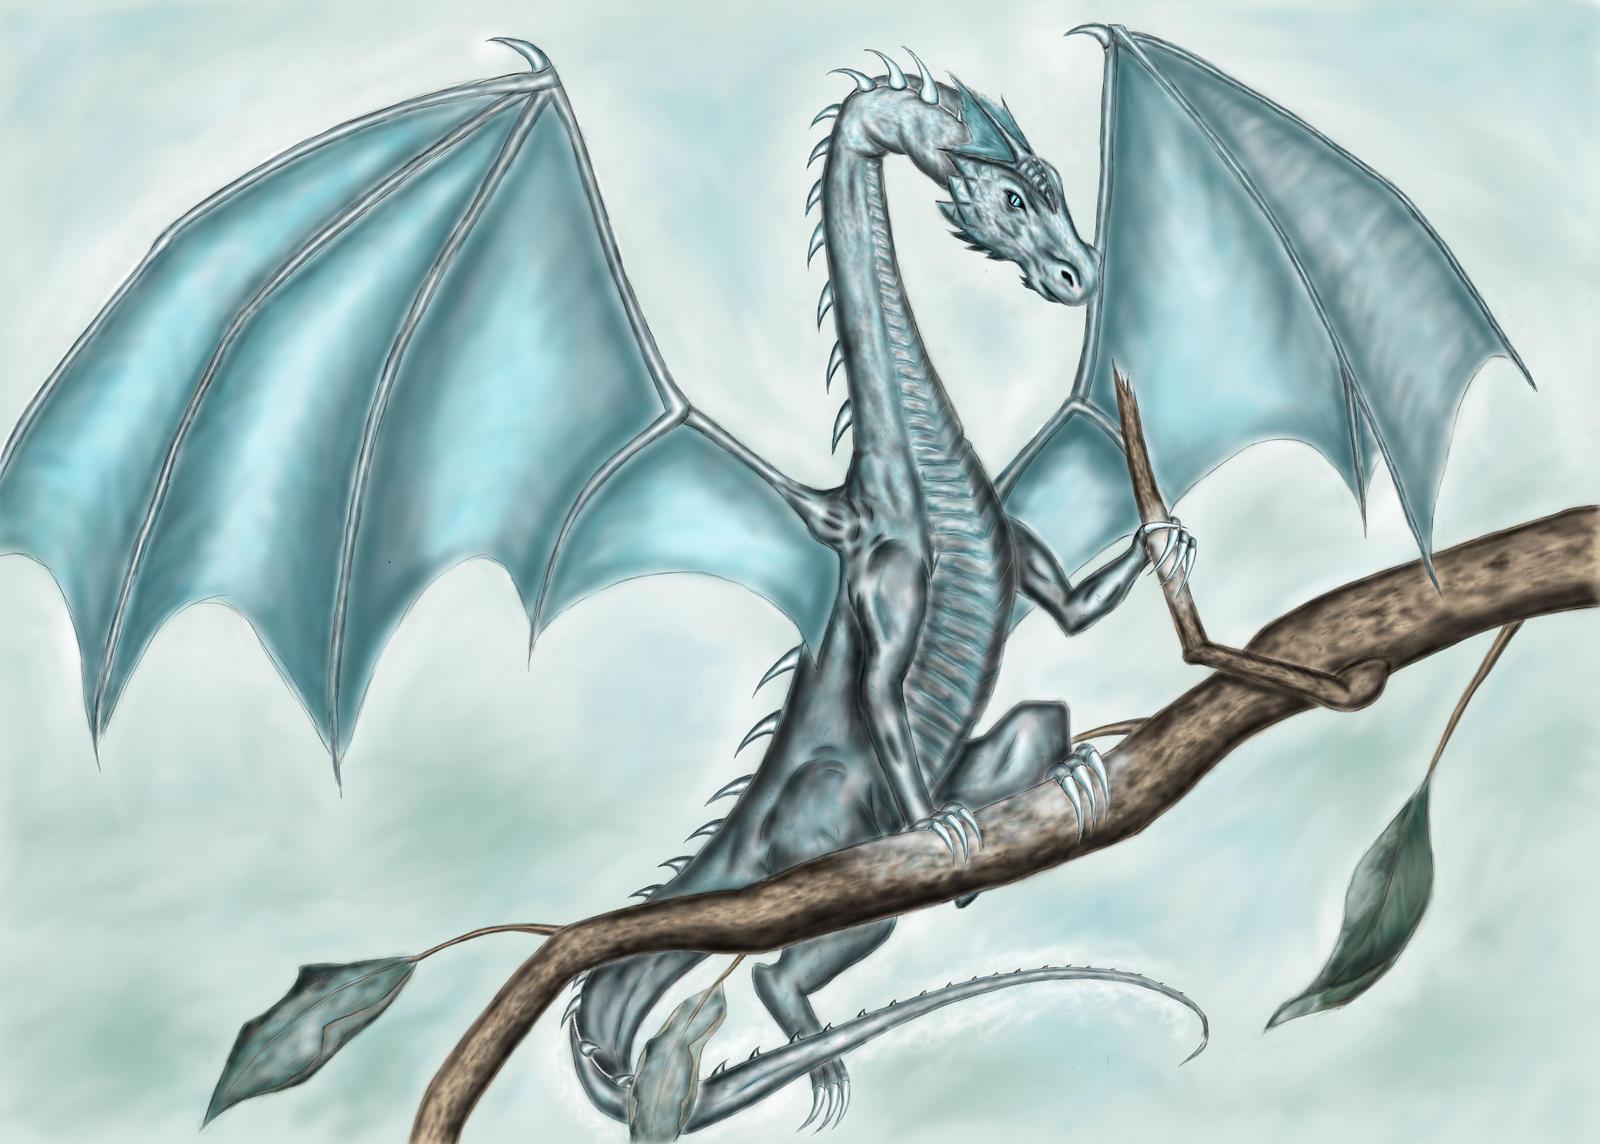 ice breathing dragons wallpaper